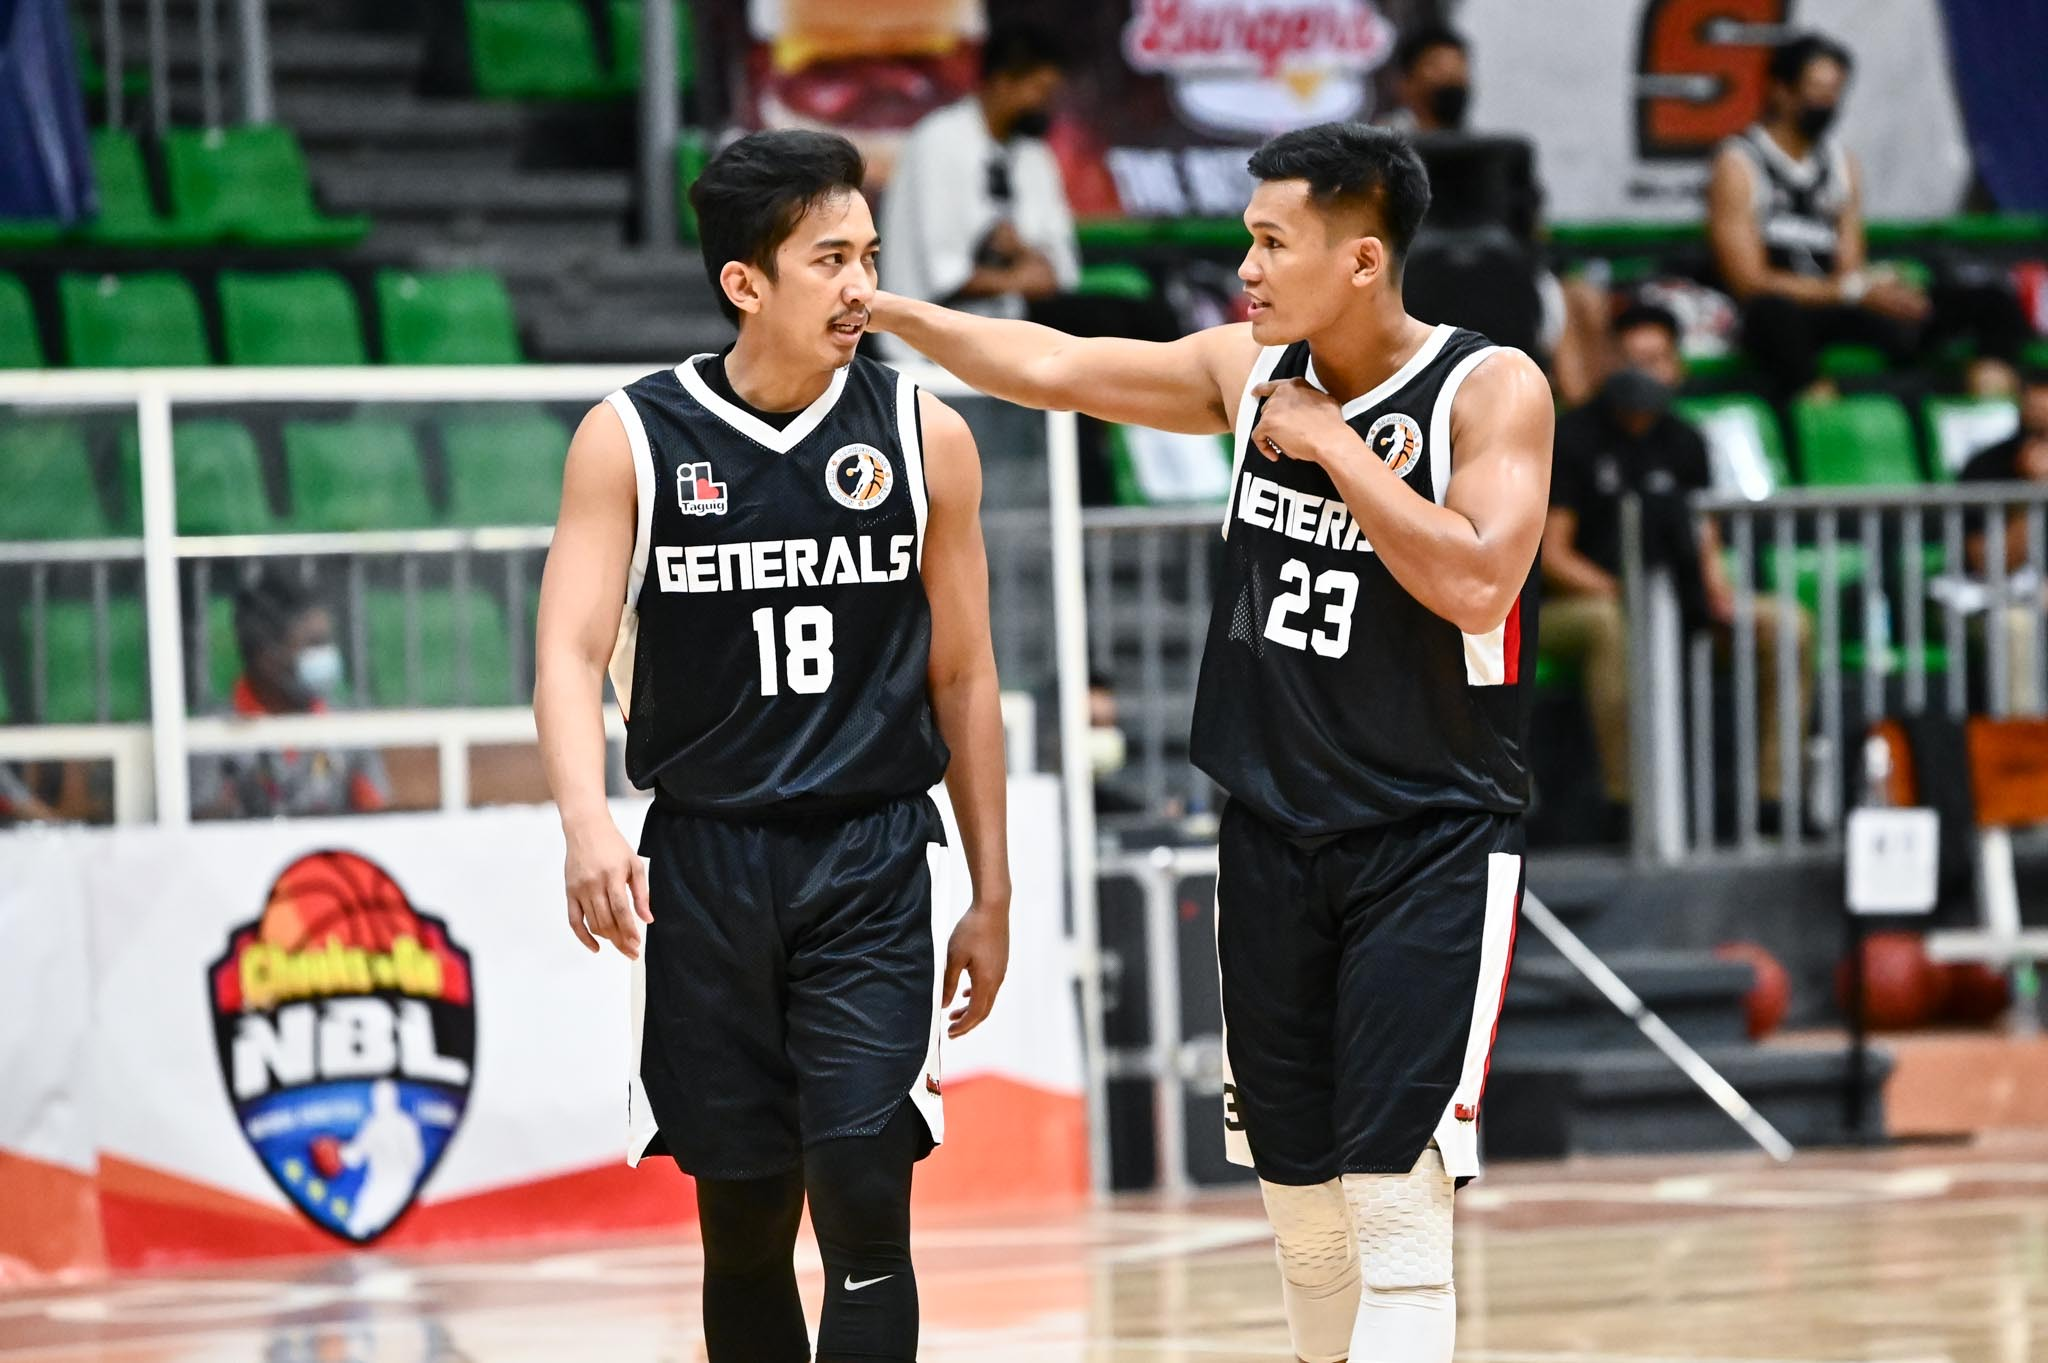 2021-Chooks-NBL-Stan-D4-vs-Taguig-Mike-Sampurna-x-Richmond-Gilbero Sampurna powers Taguig to successful NBL debut as Stan D4 drops to 0-4 Basketball NBL News  - philippine sports news